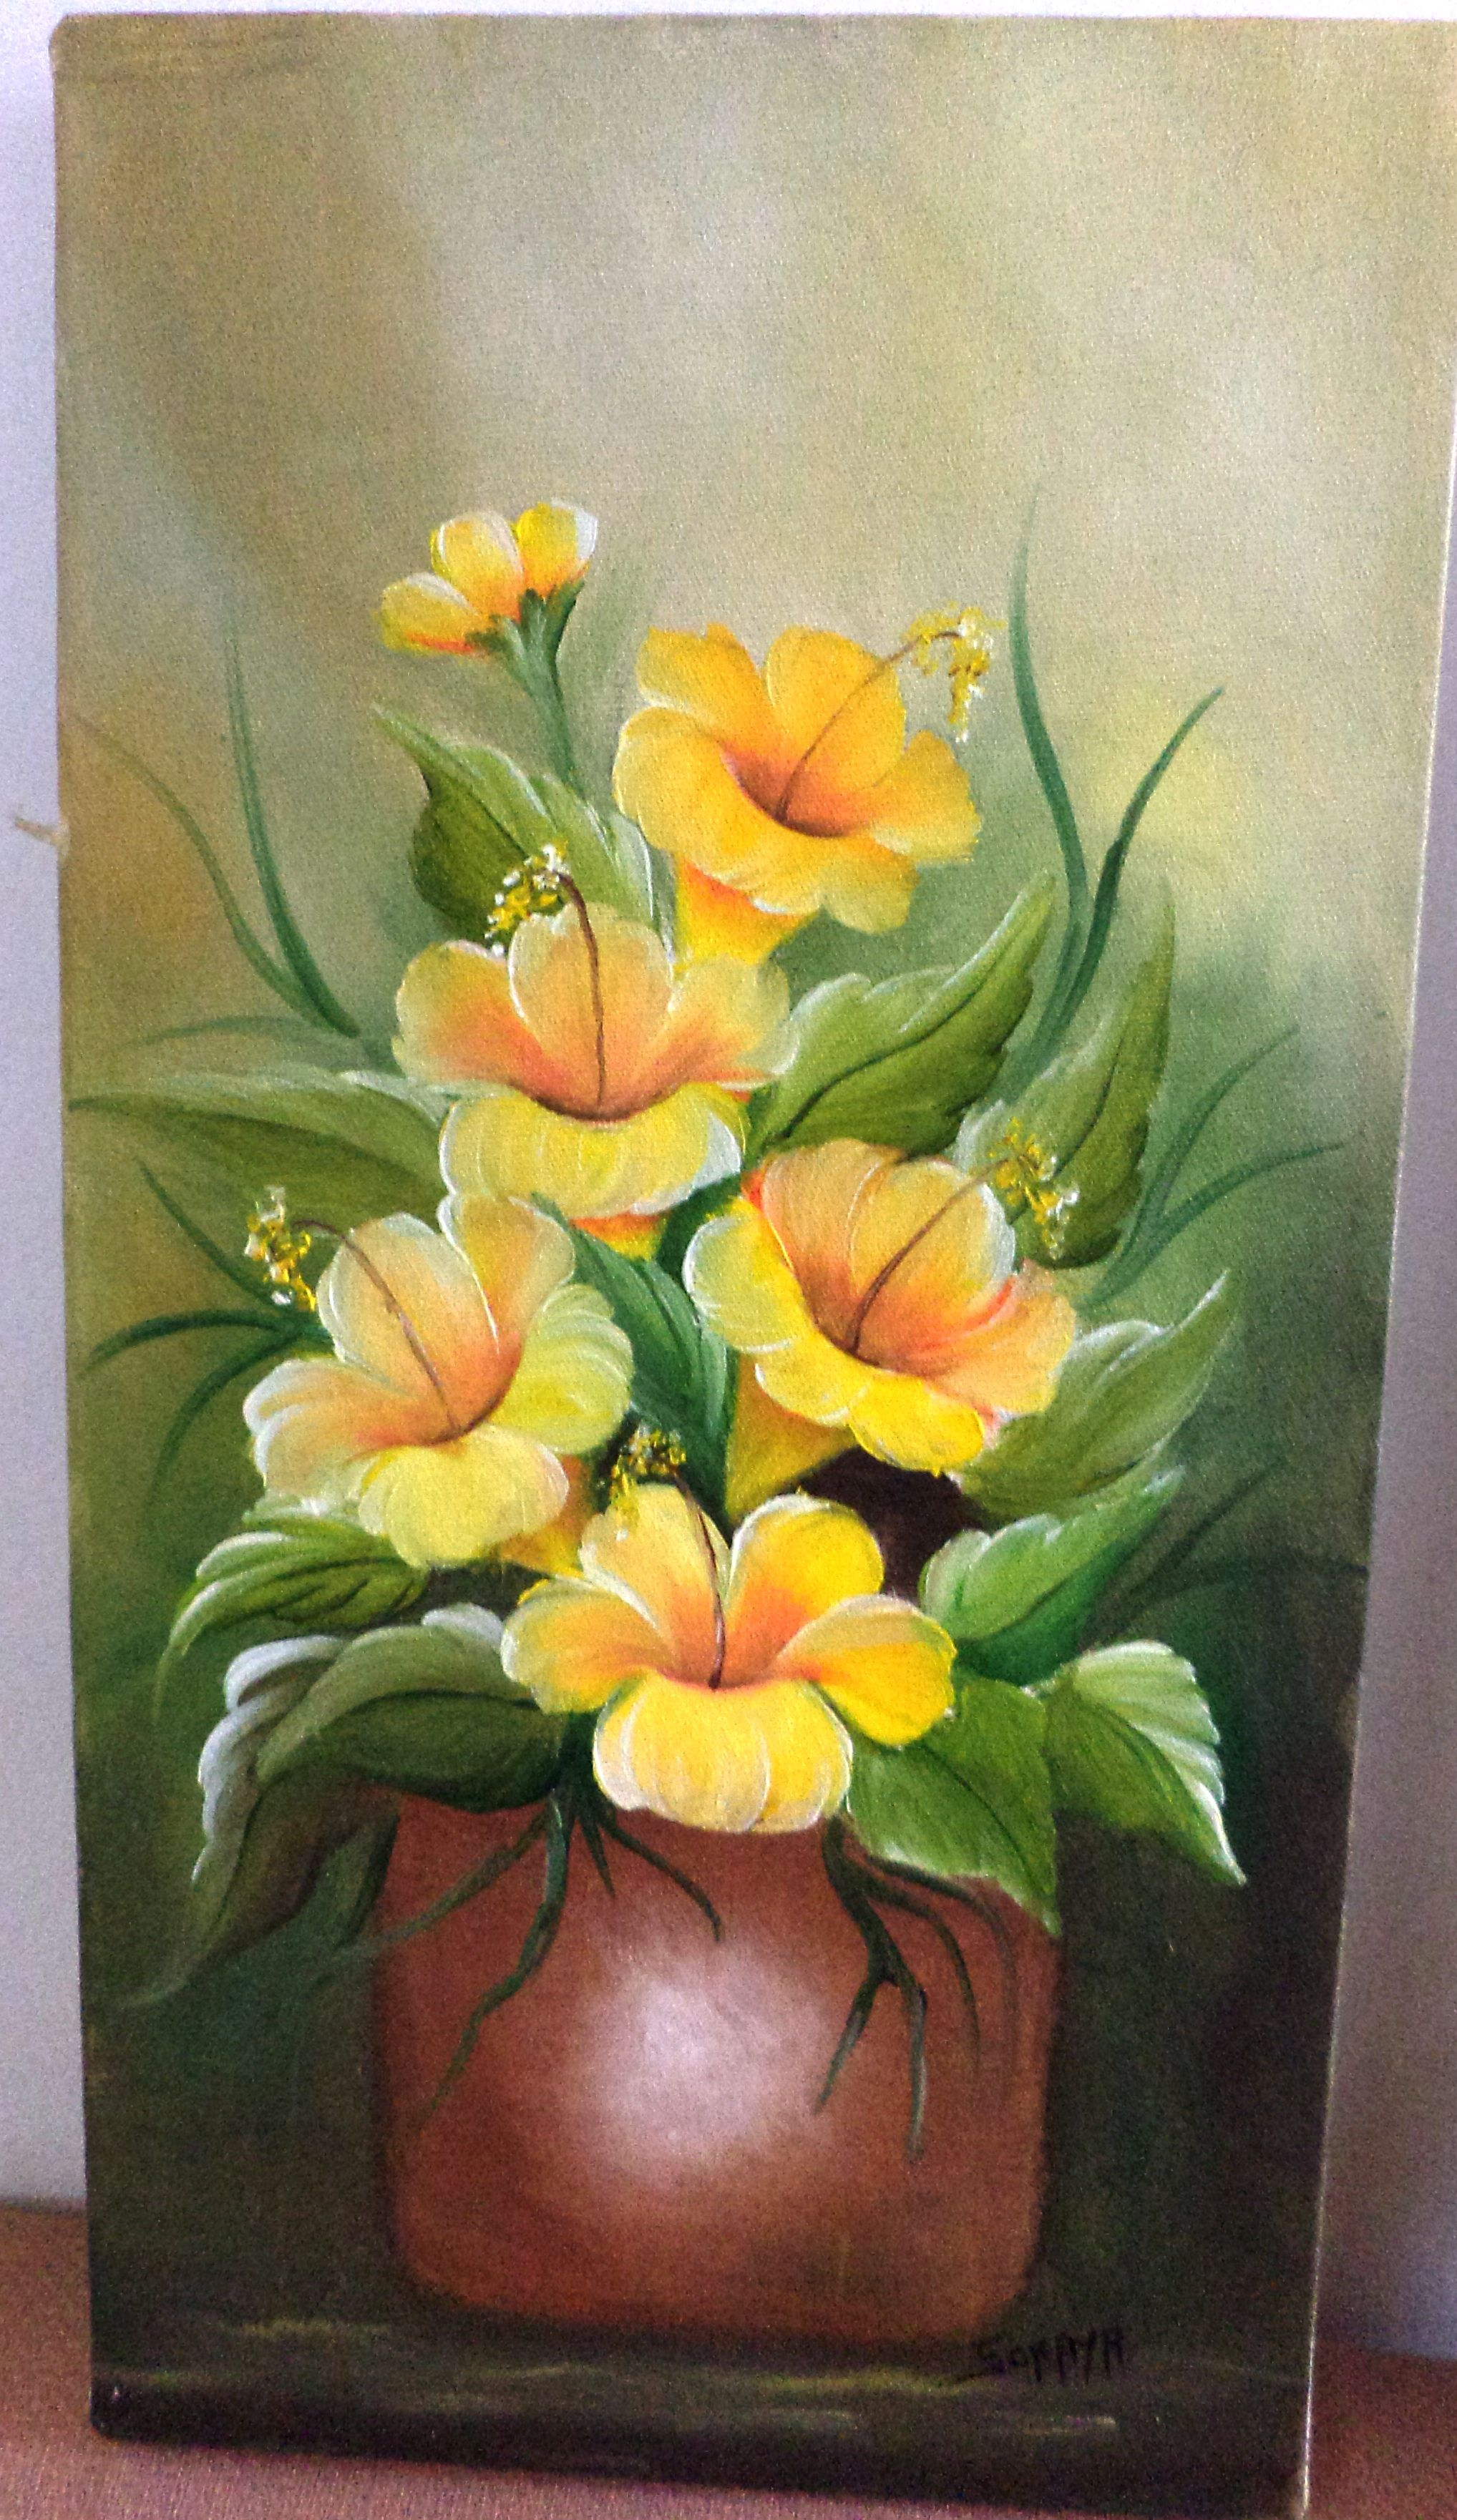 leo sobre tela pinturas pinterest peinture fleur et peinture d corative. Black Bedroom Furniture Sets. Home Design Ideas